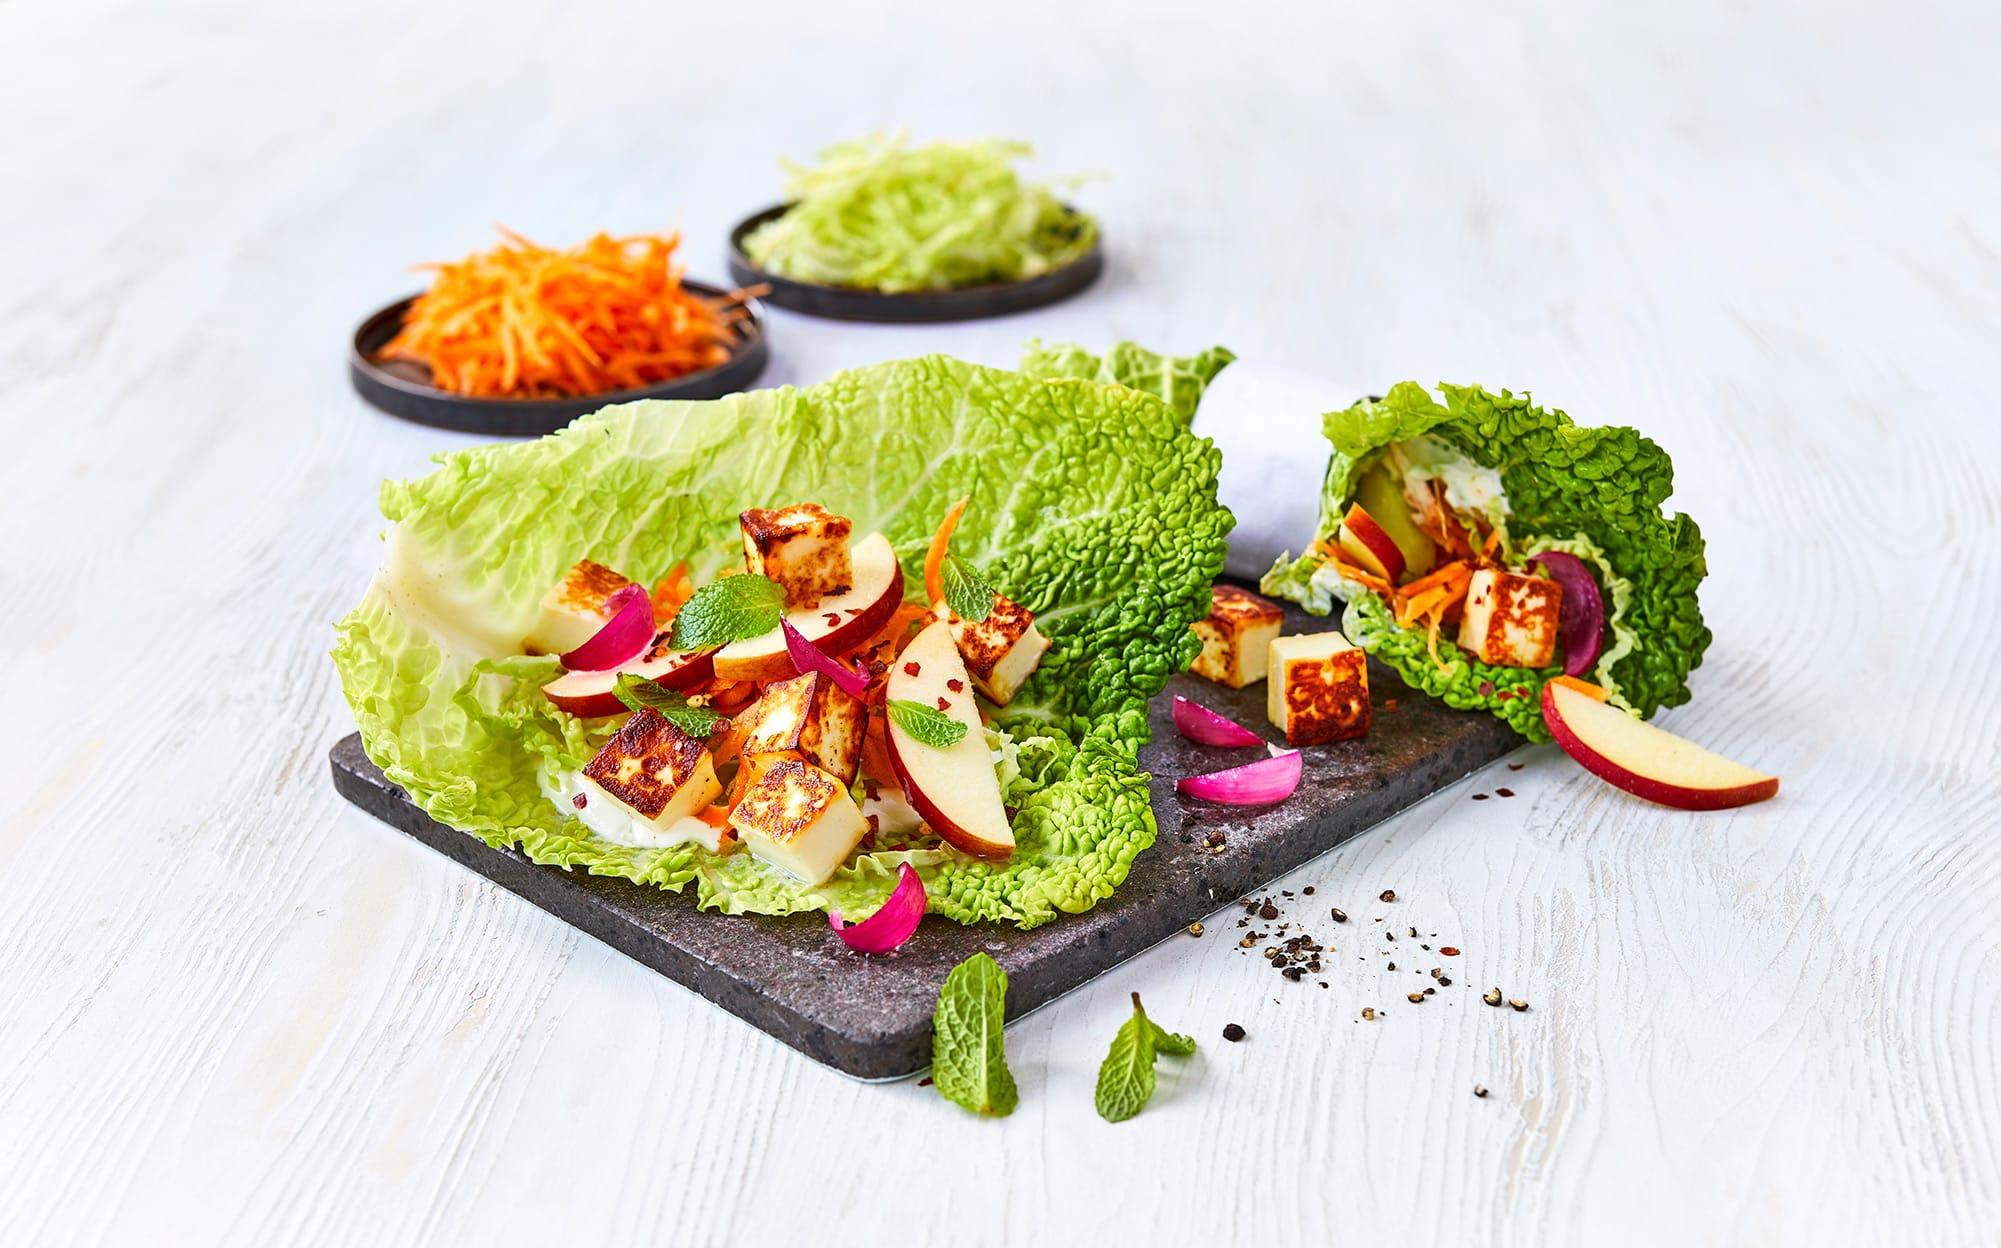 Kålwraps med friske grøntsager, halloumi og urter på toppen